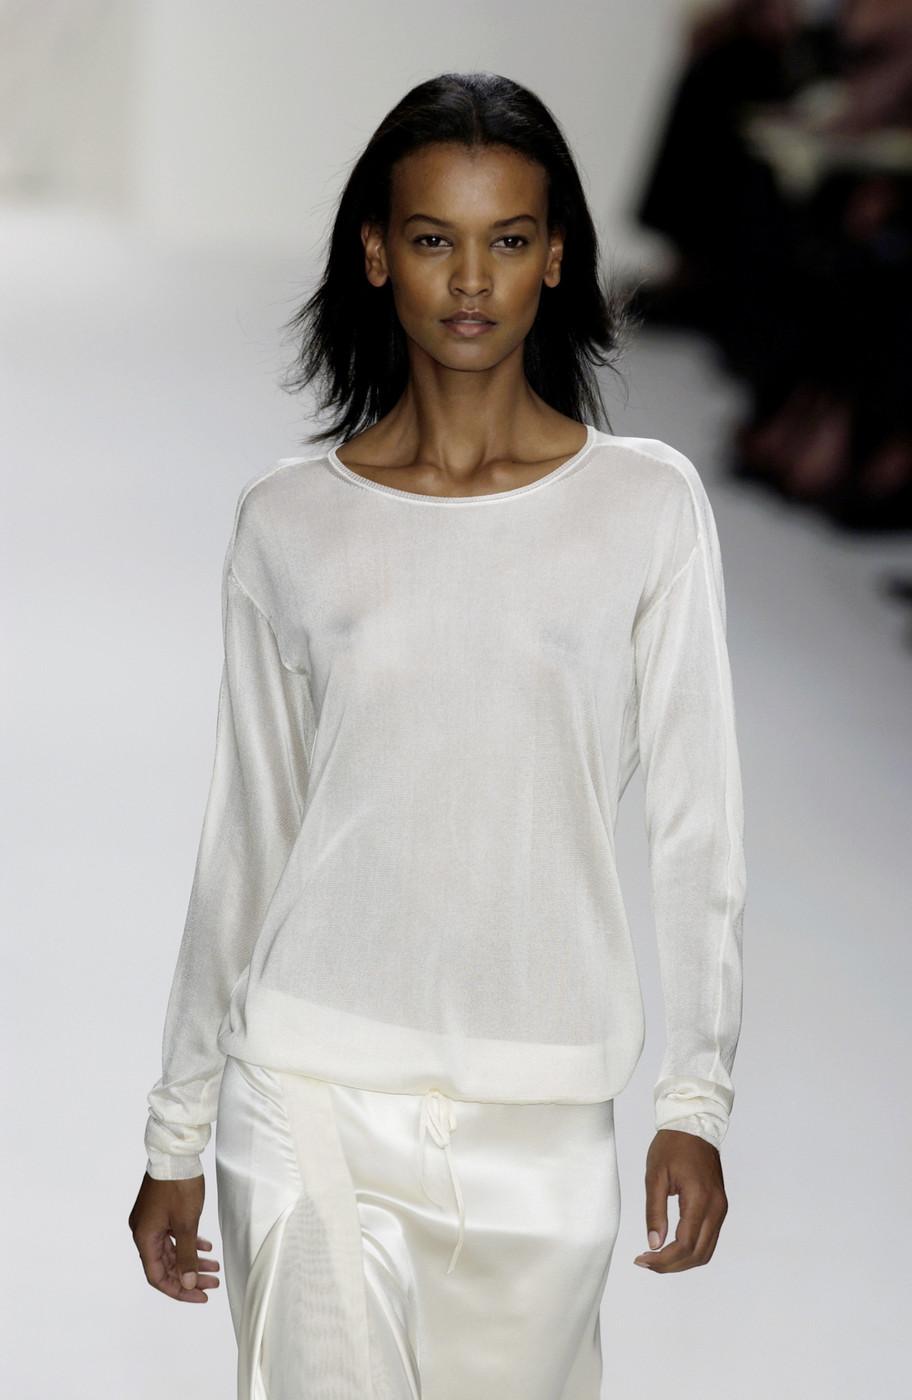 Calvin Klein Spring/Summer 2003